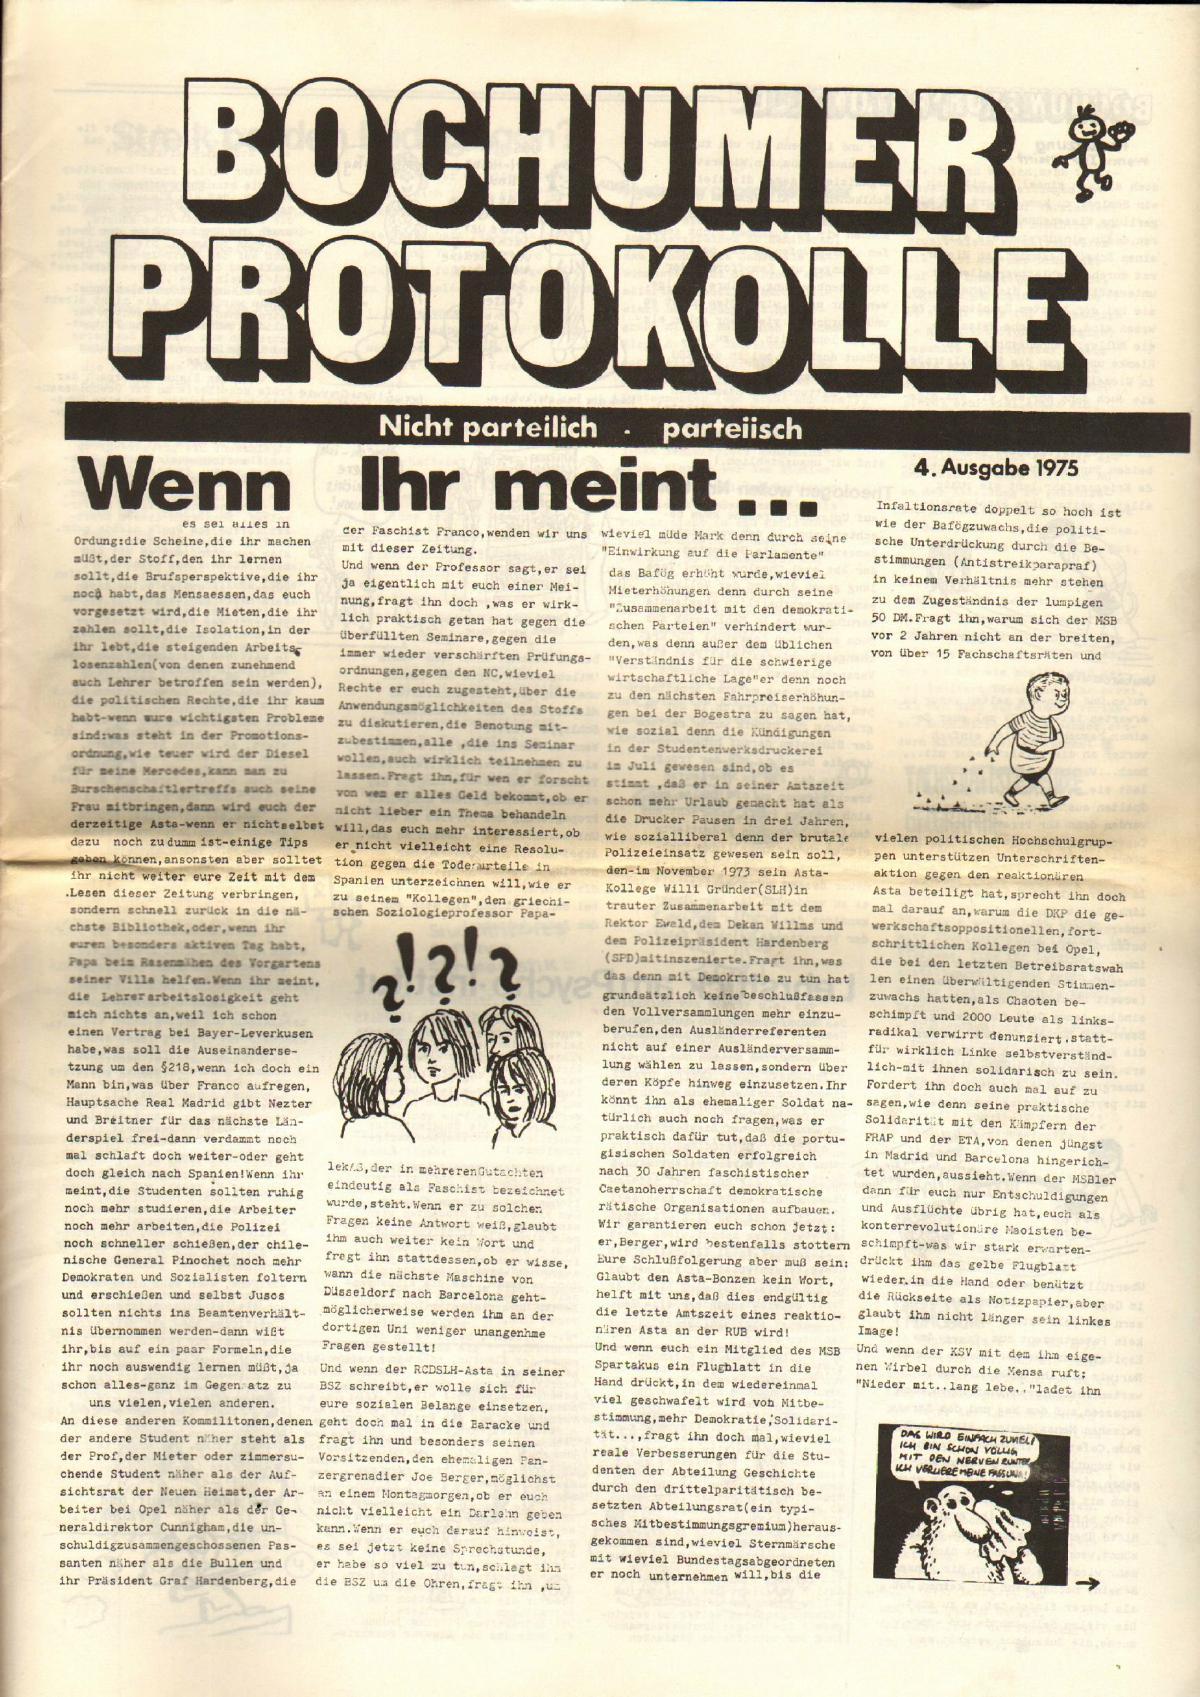 Bochumer_Protokolle_19751000_001